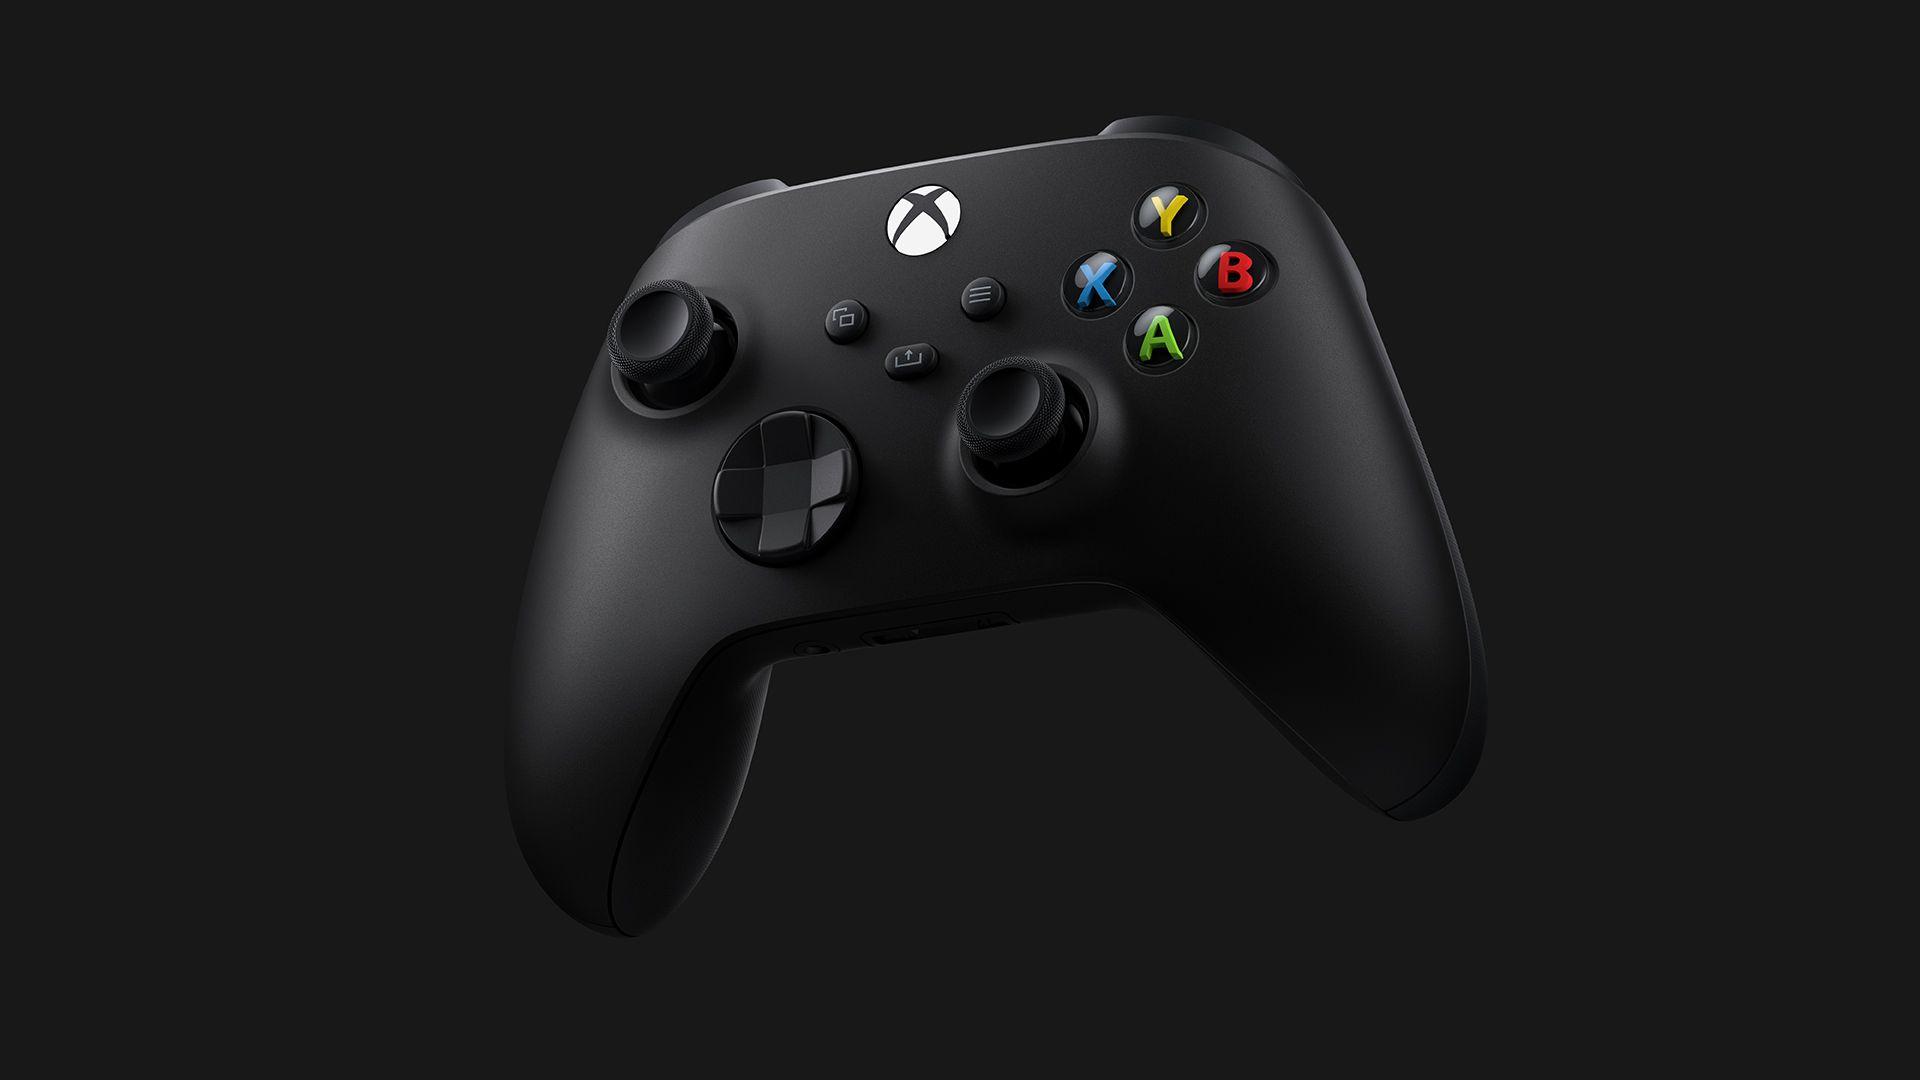 Pin On Xbox One X Box Meme